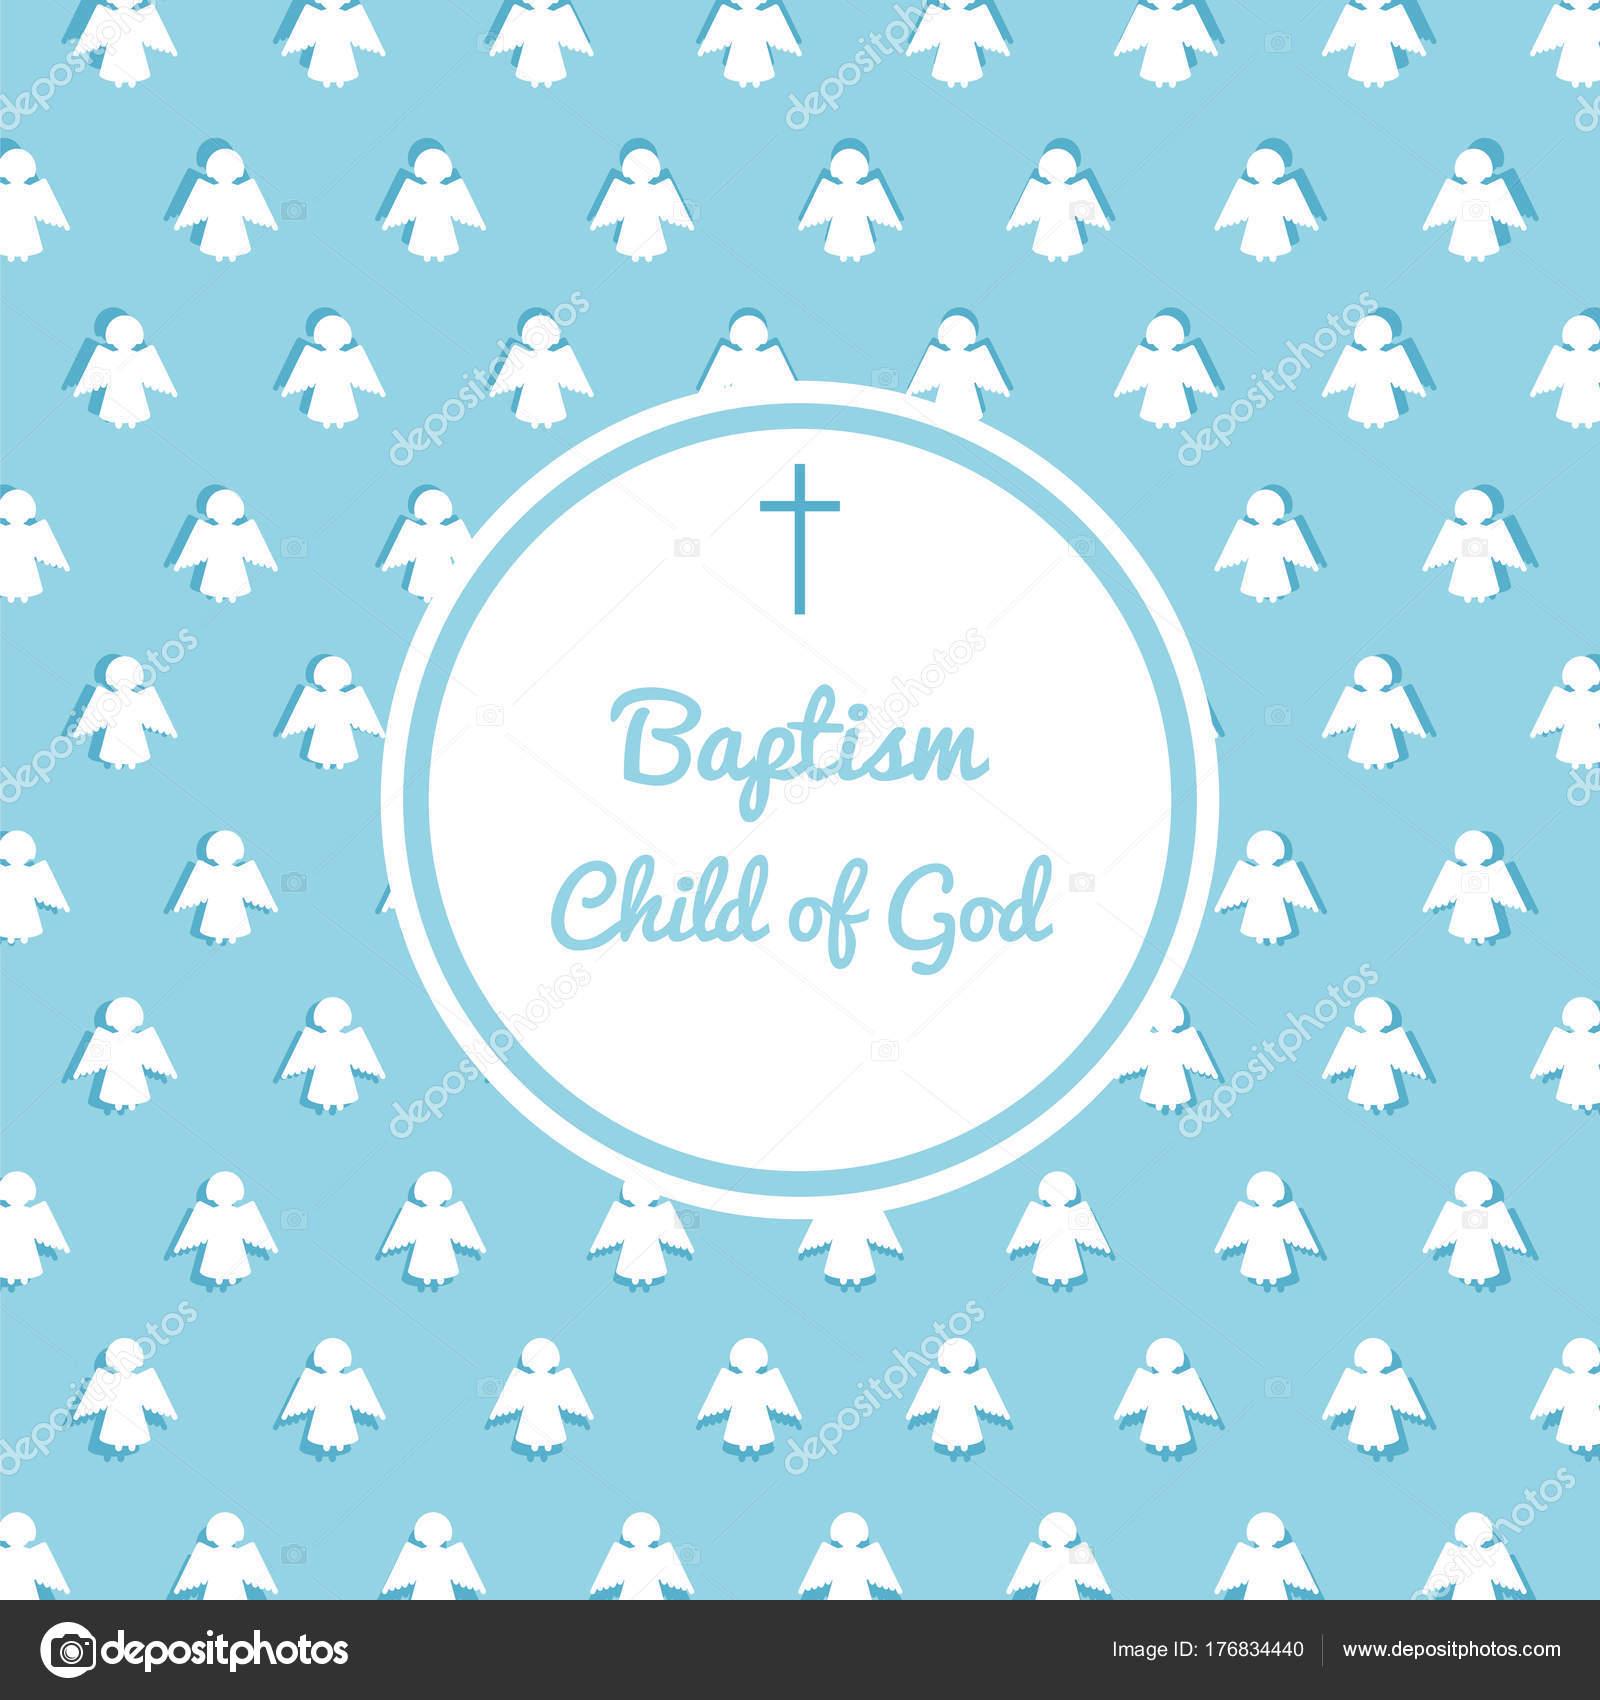 Baptism invitations templates | Baptism invitation template — Stock Vector  © GreenVector #176834440